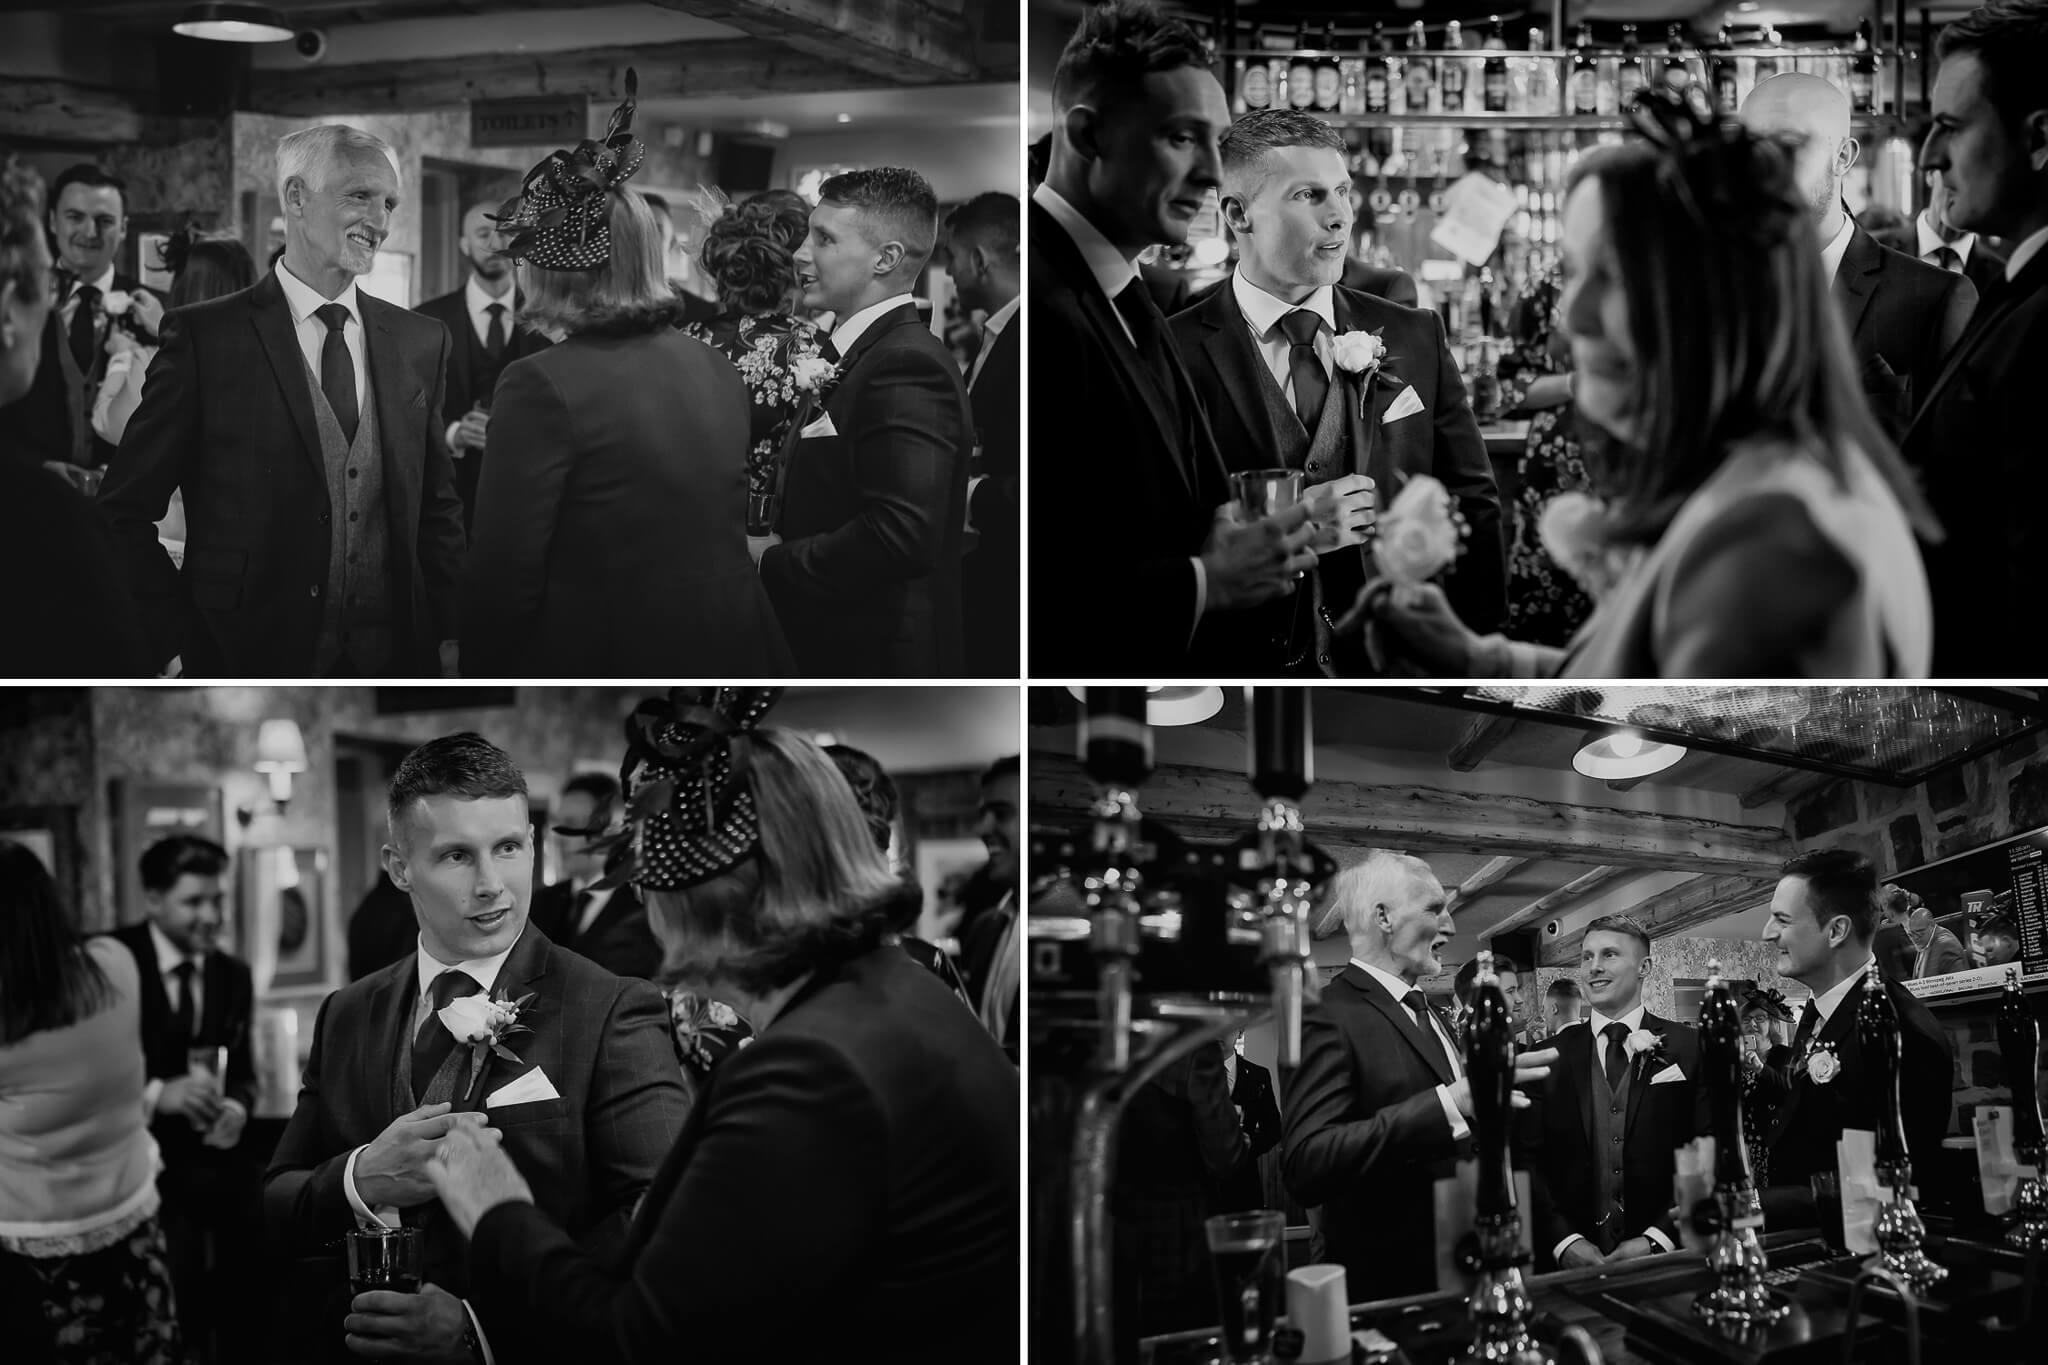 groom-groomsmen-pub-family-time-wedding-day-wigan